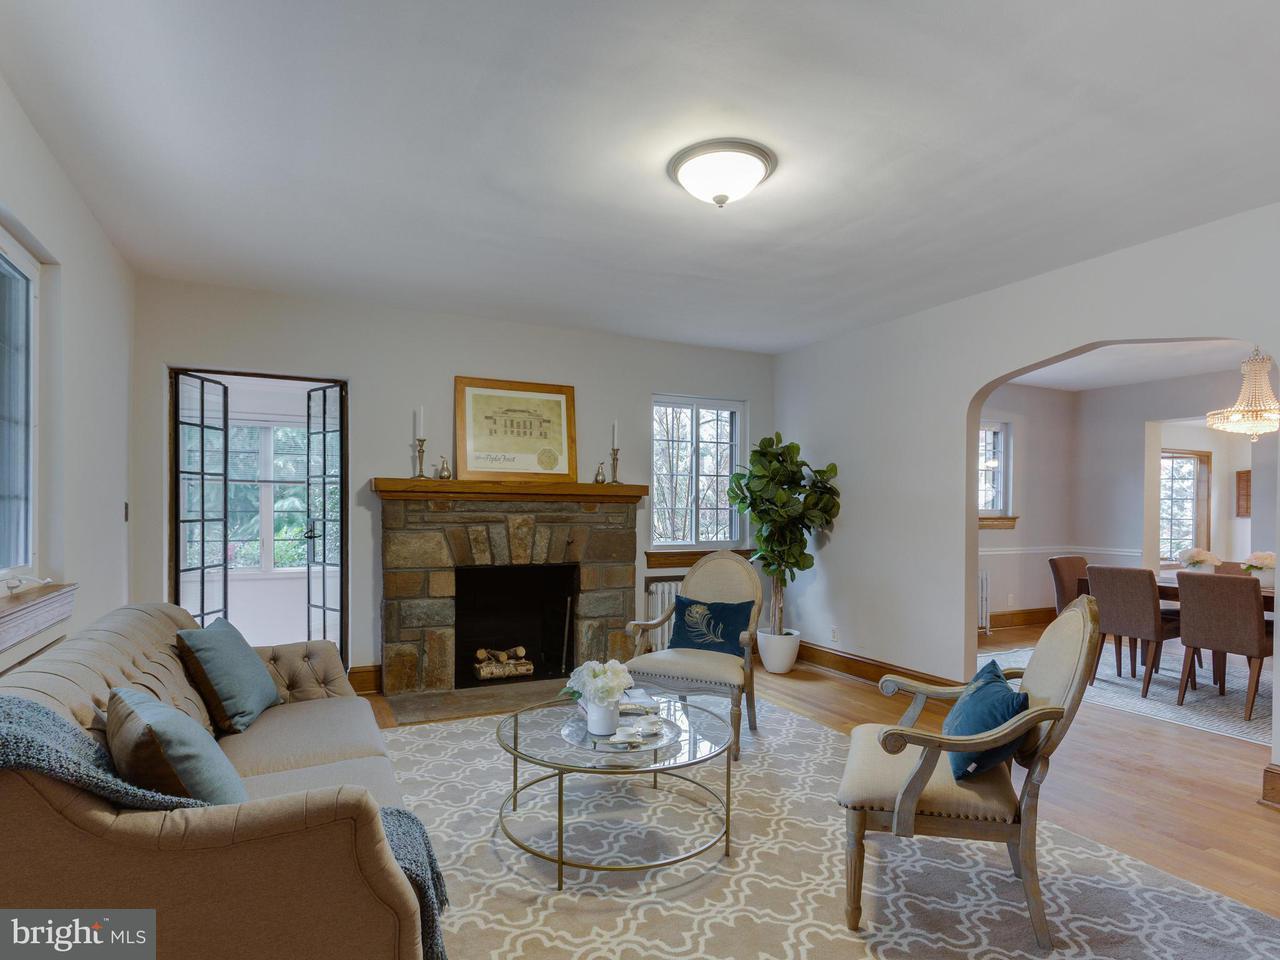 Single Family Home for Sale at 5500 Nebraska Ave Nw 5500 Nebraska Ave Nw Washington, District Of Columbia 20015 United States